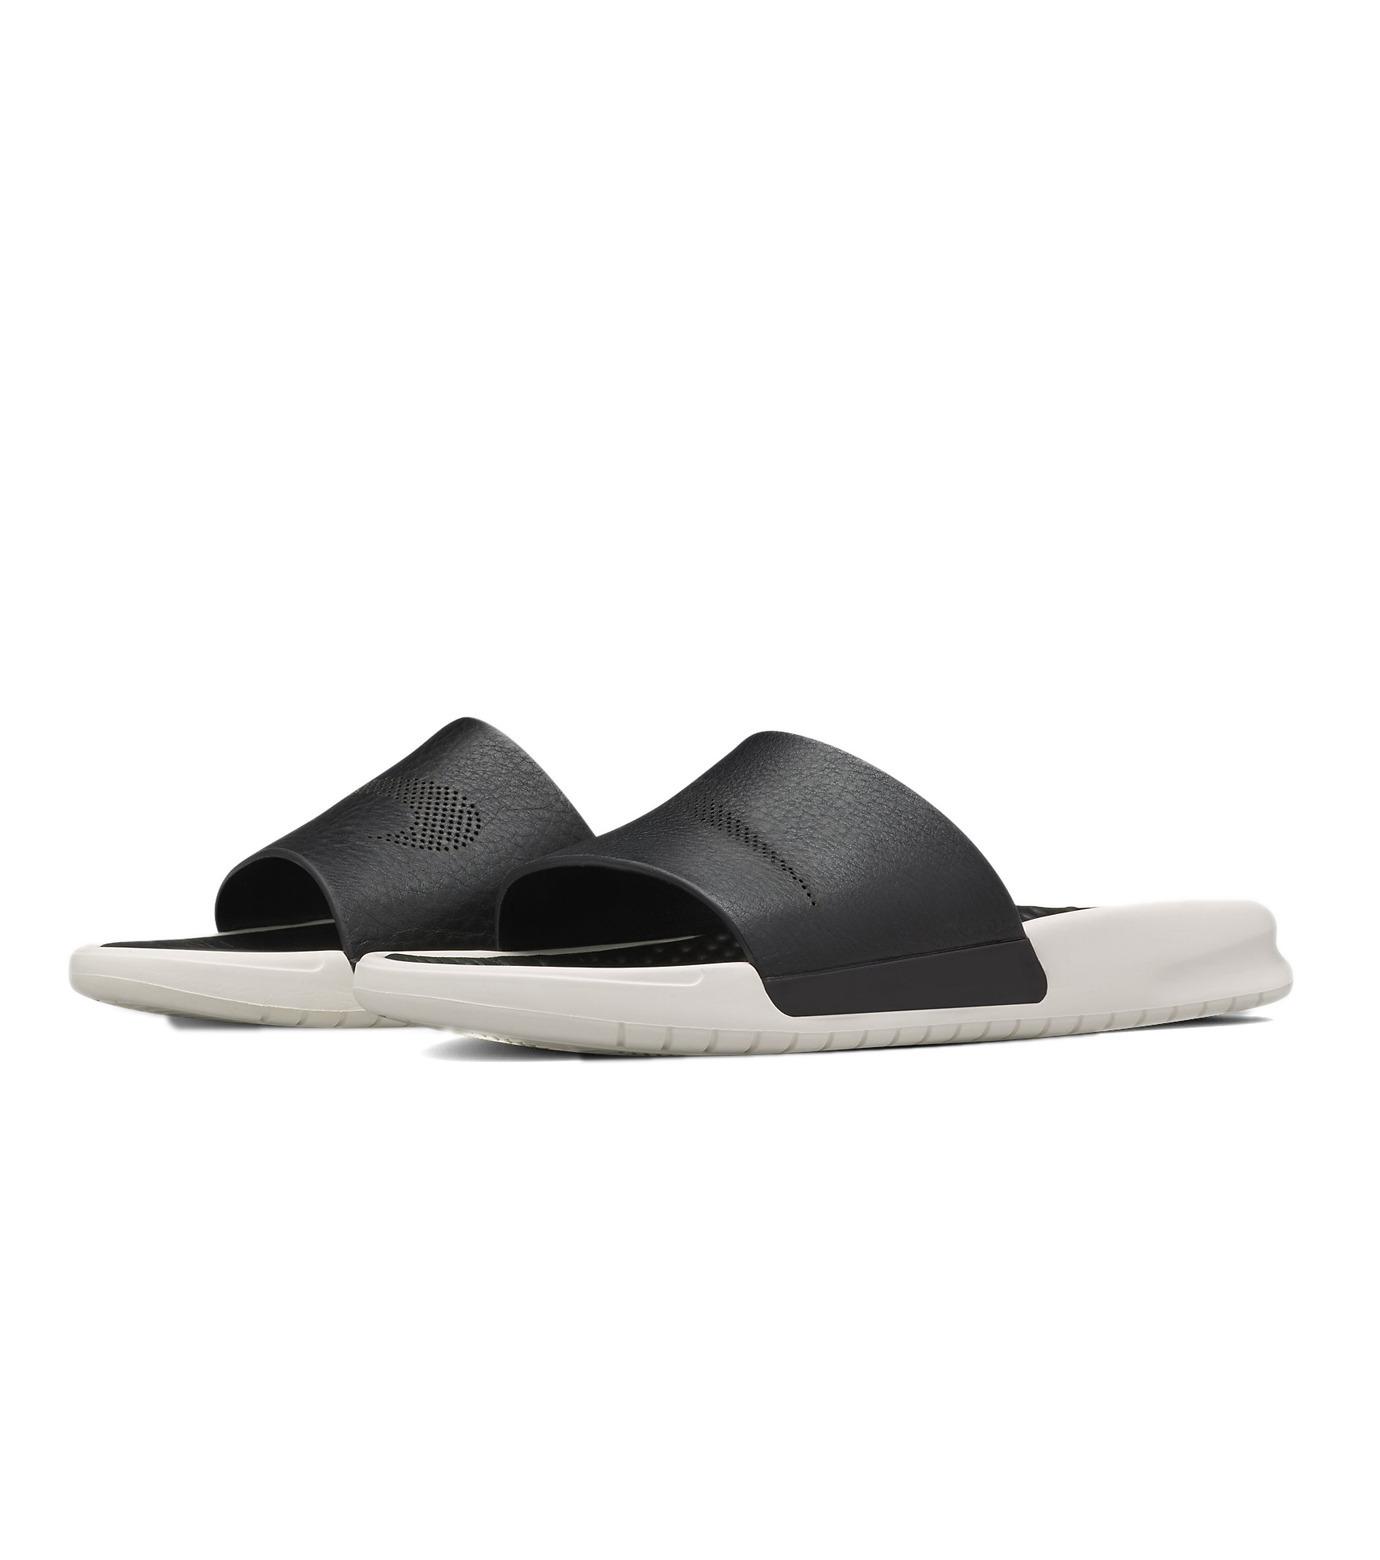 NIKE(ナイキ)のWMNS BENASSI SLIDE LUX-BLACK(シューズ/shoes)-818738-001-13 拡大詳細画像3